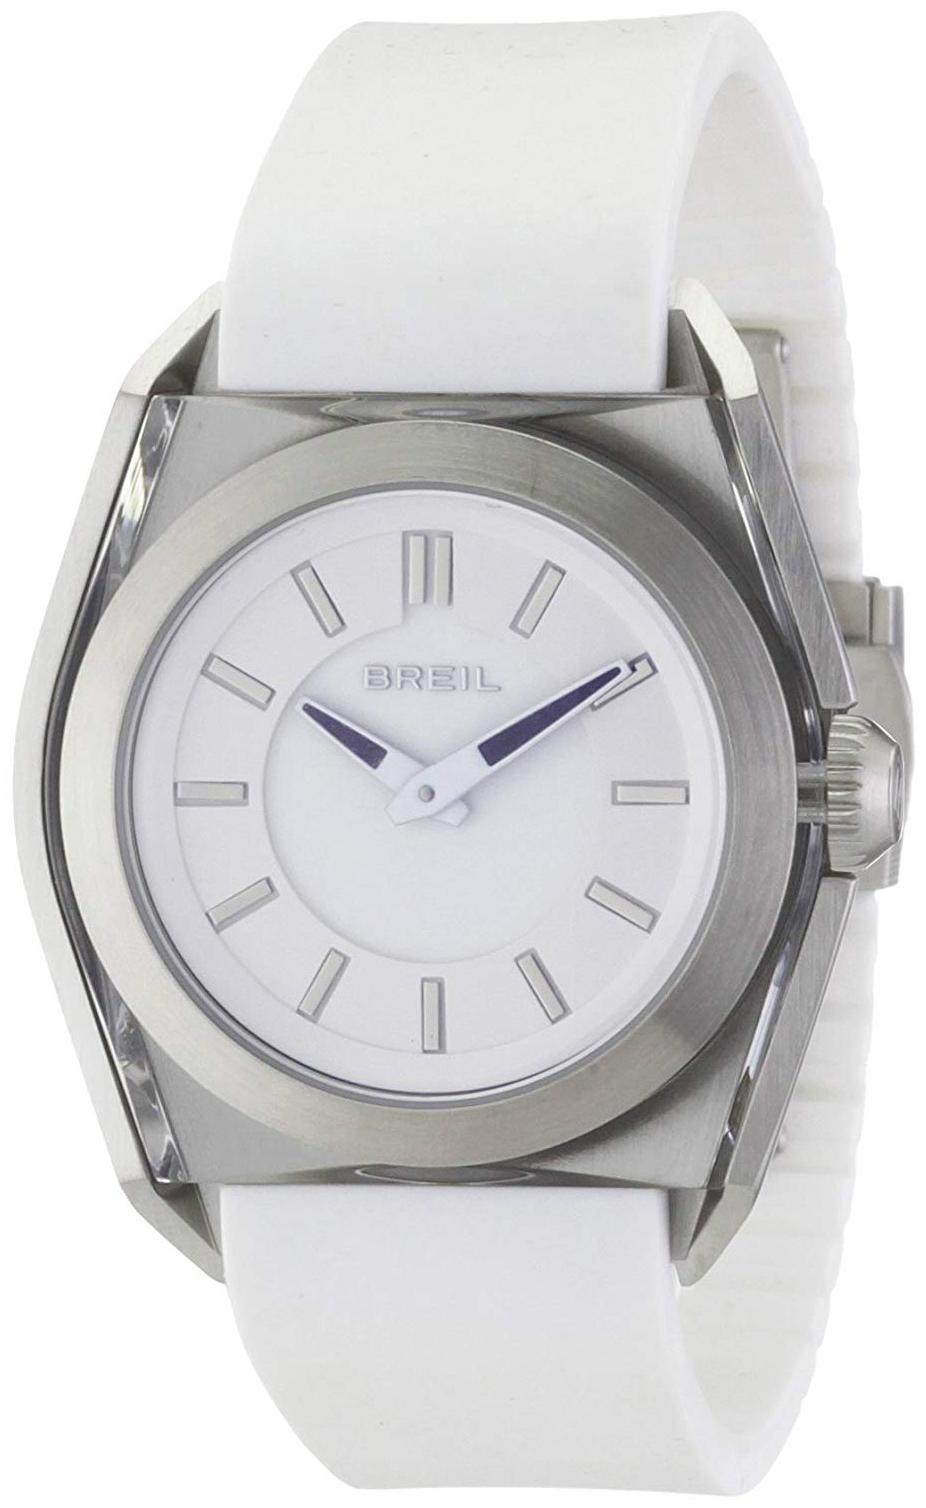 Breil Mantalite Naisten kello TW0809 Valkoinen/Kumi Ø38 mm